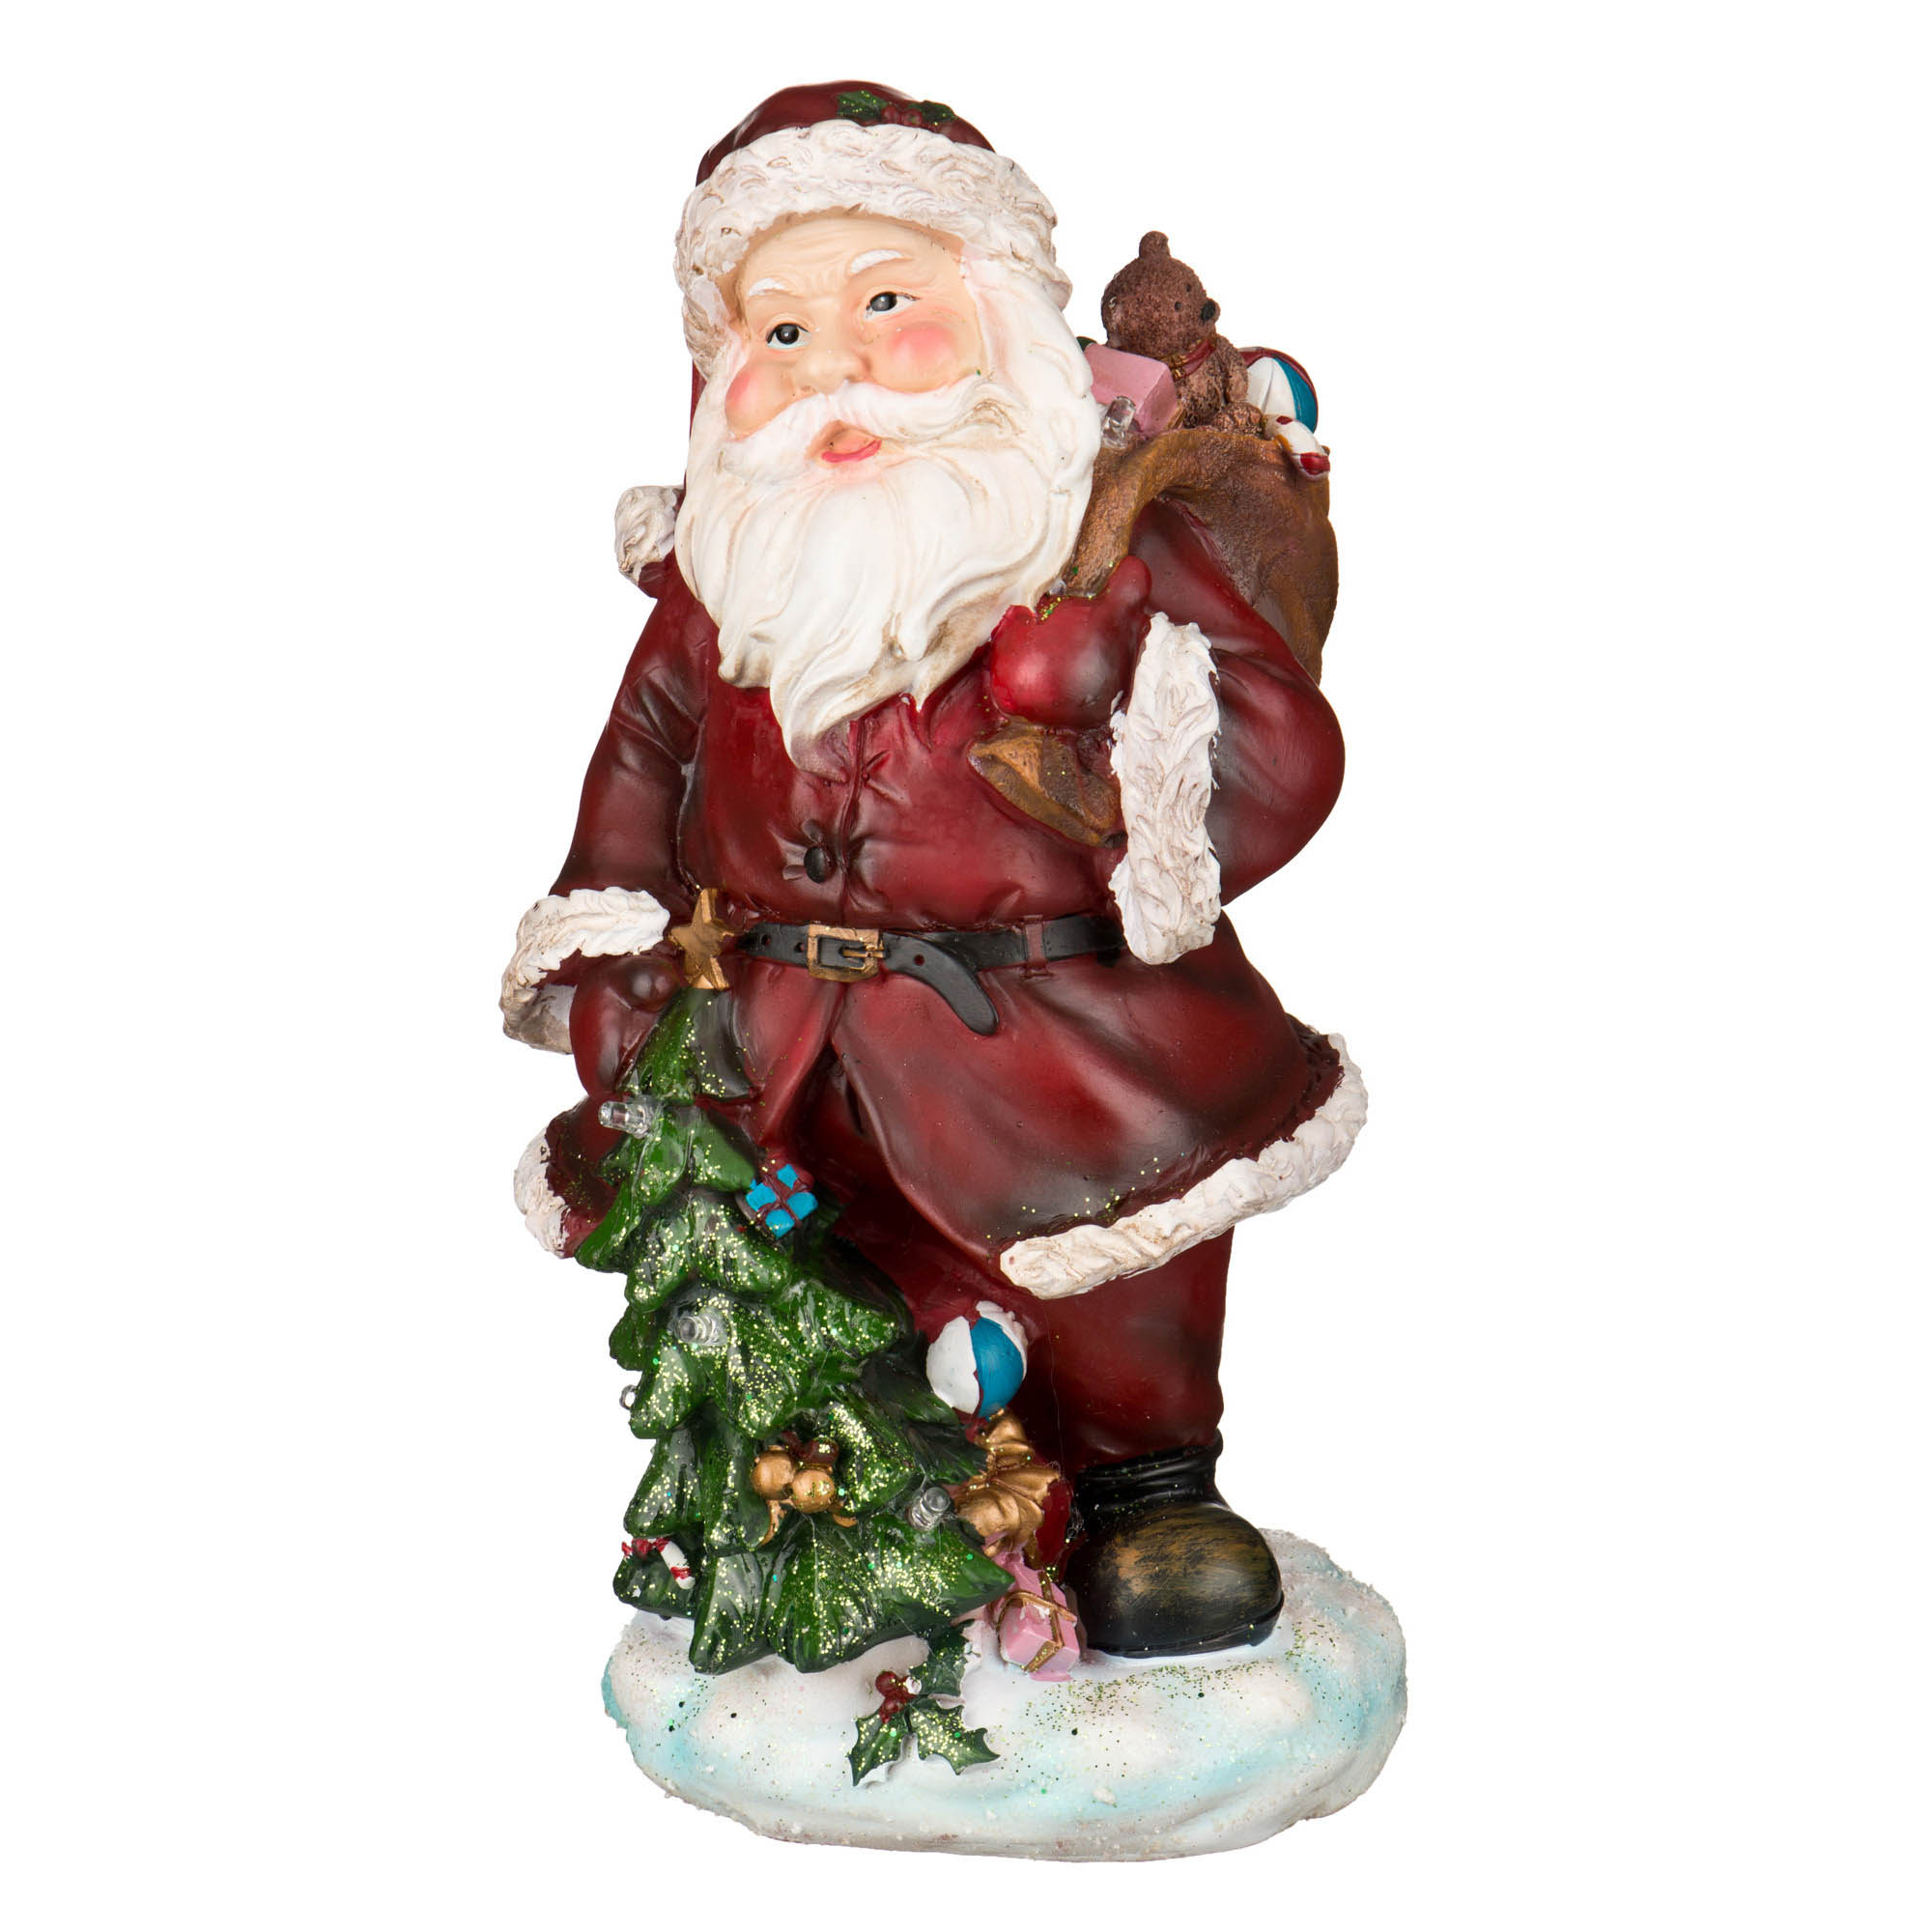 {} Lefard Интерьерная игрушка Дед Мороз (14х14х30 см) lefard интерьерная игрушка jan 5х6х13 см